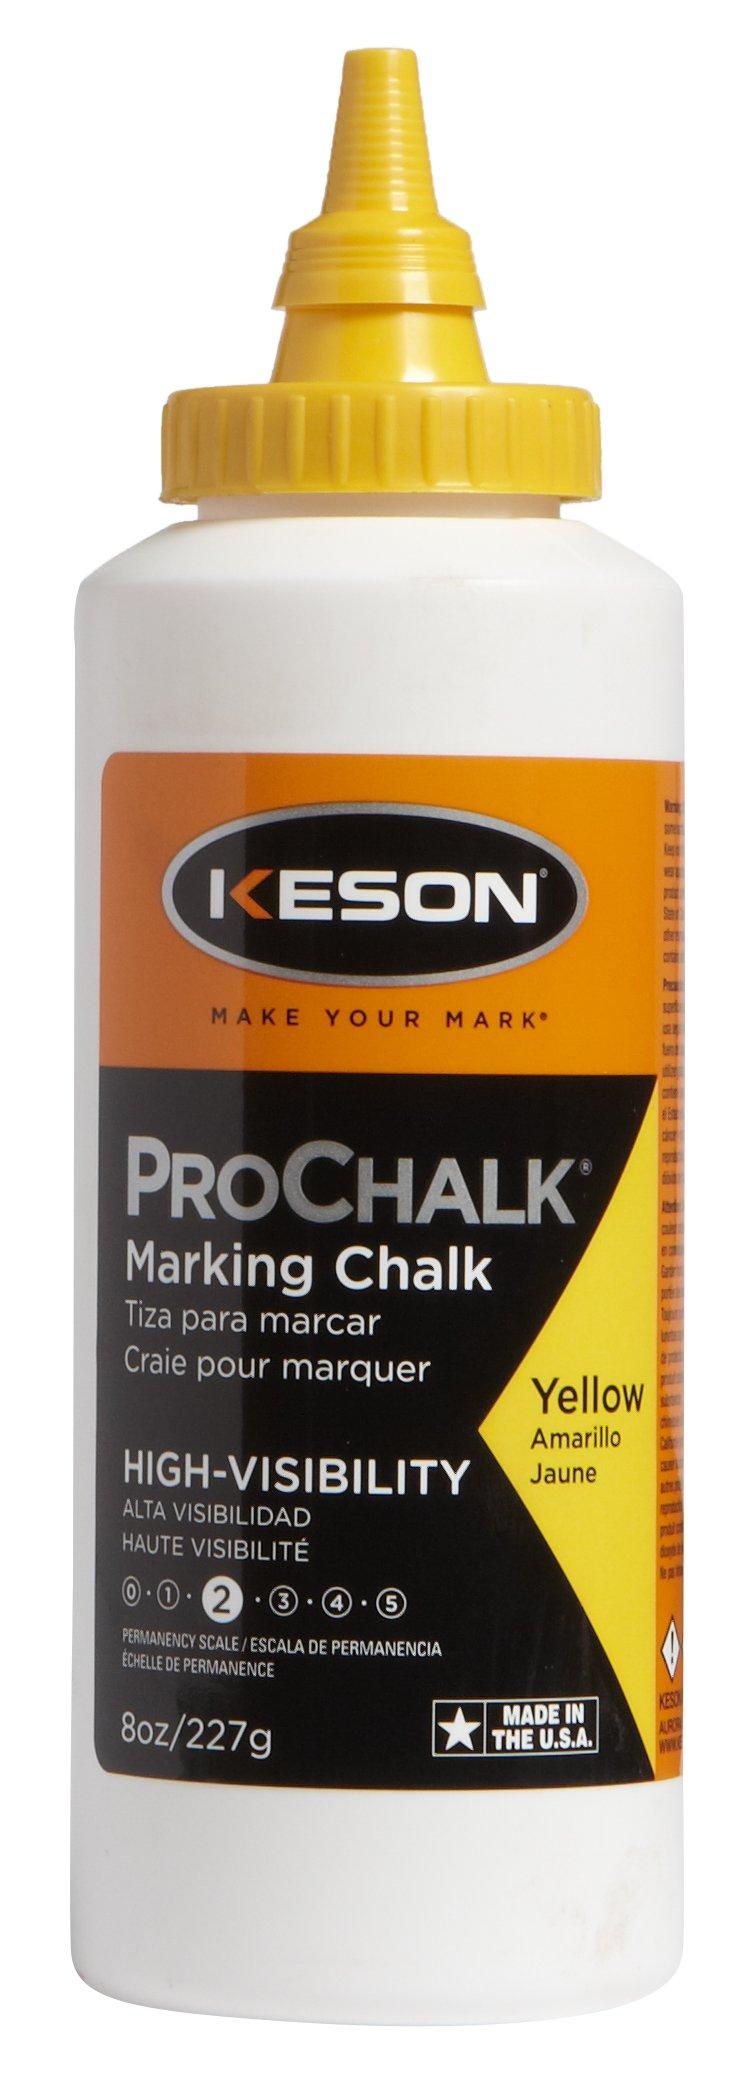 Keson 8Y ProChalk High Visibility Marking Chalk - Level 2, Yellow, 8-Ounce